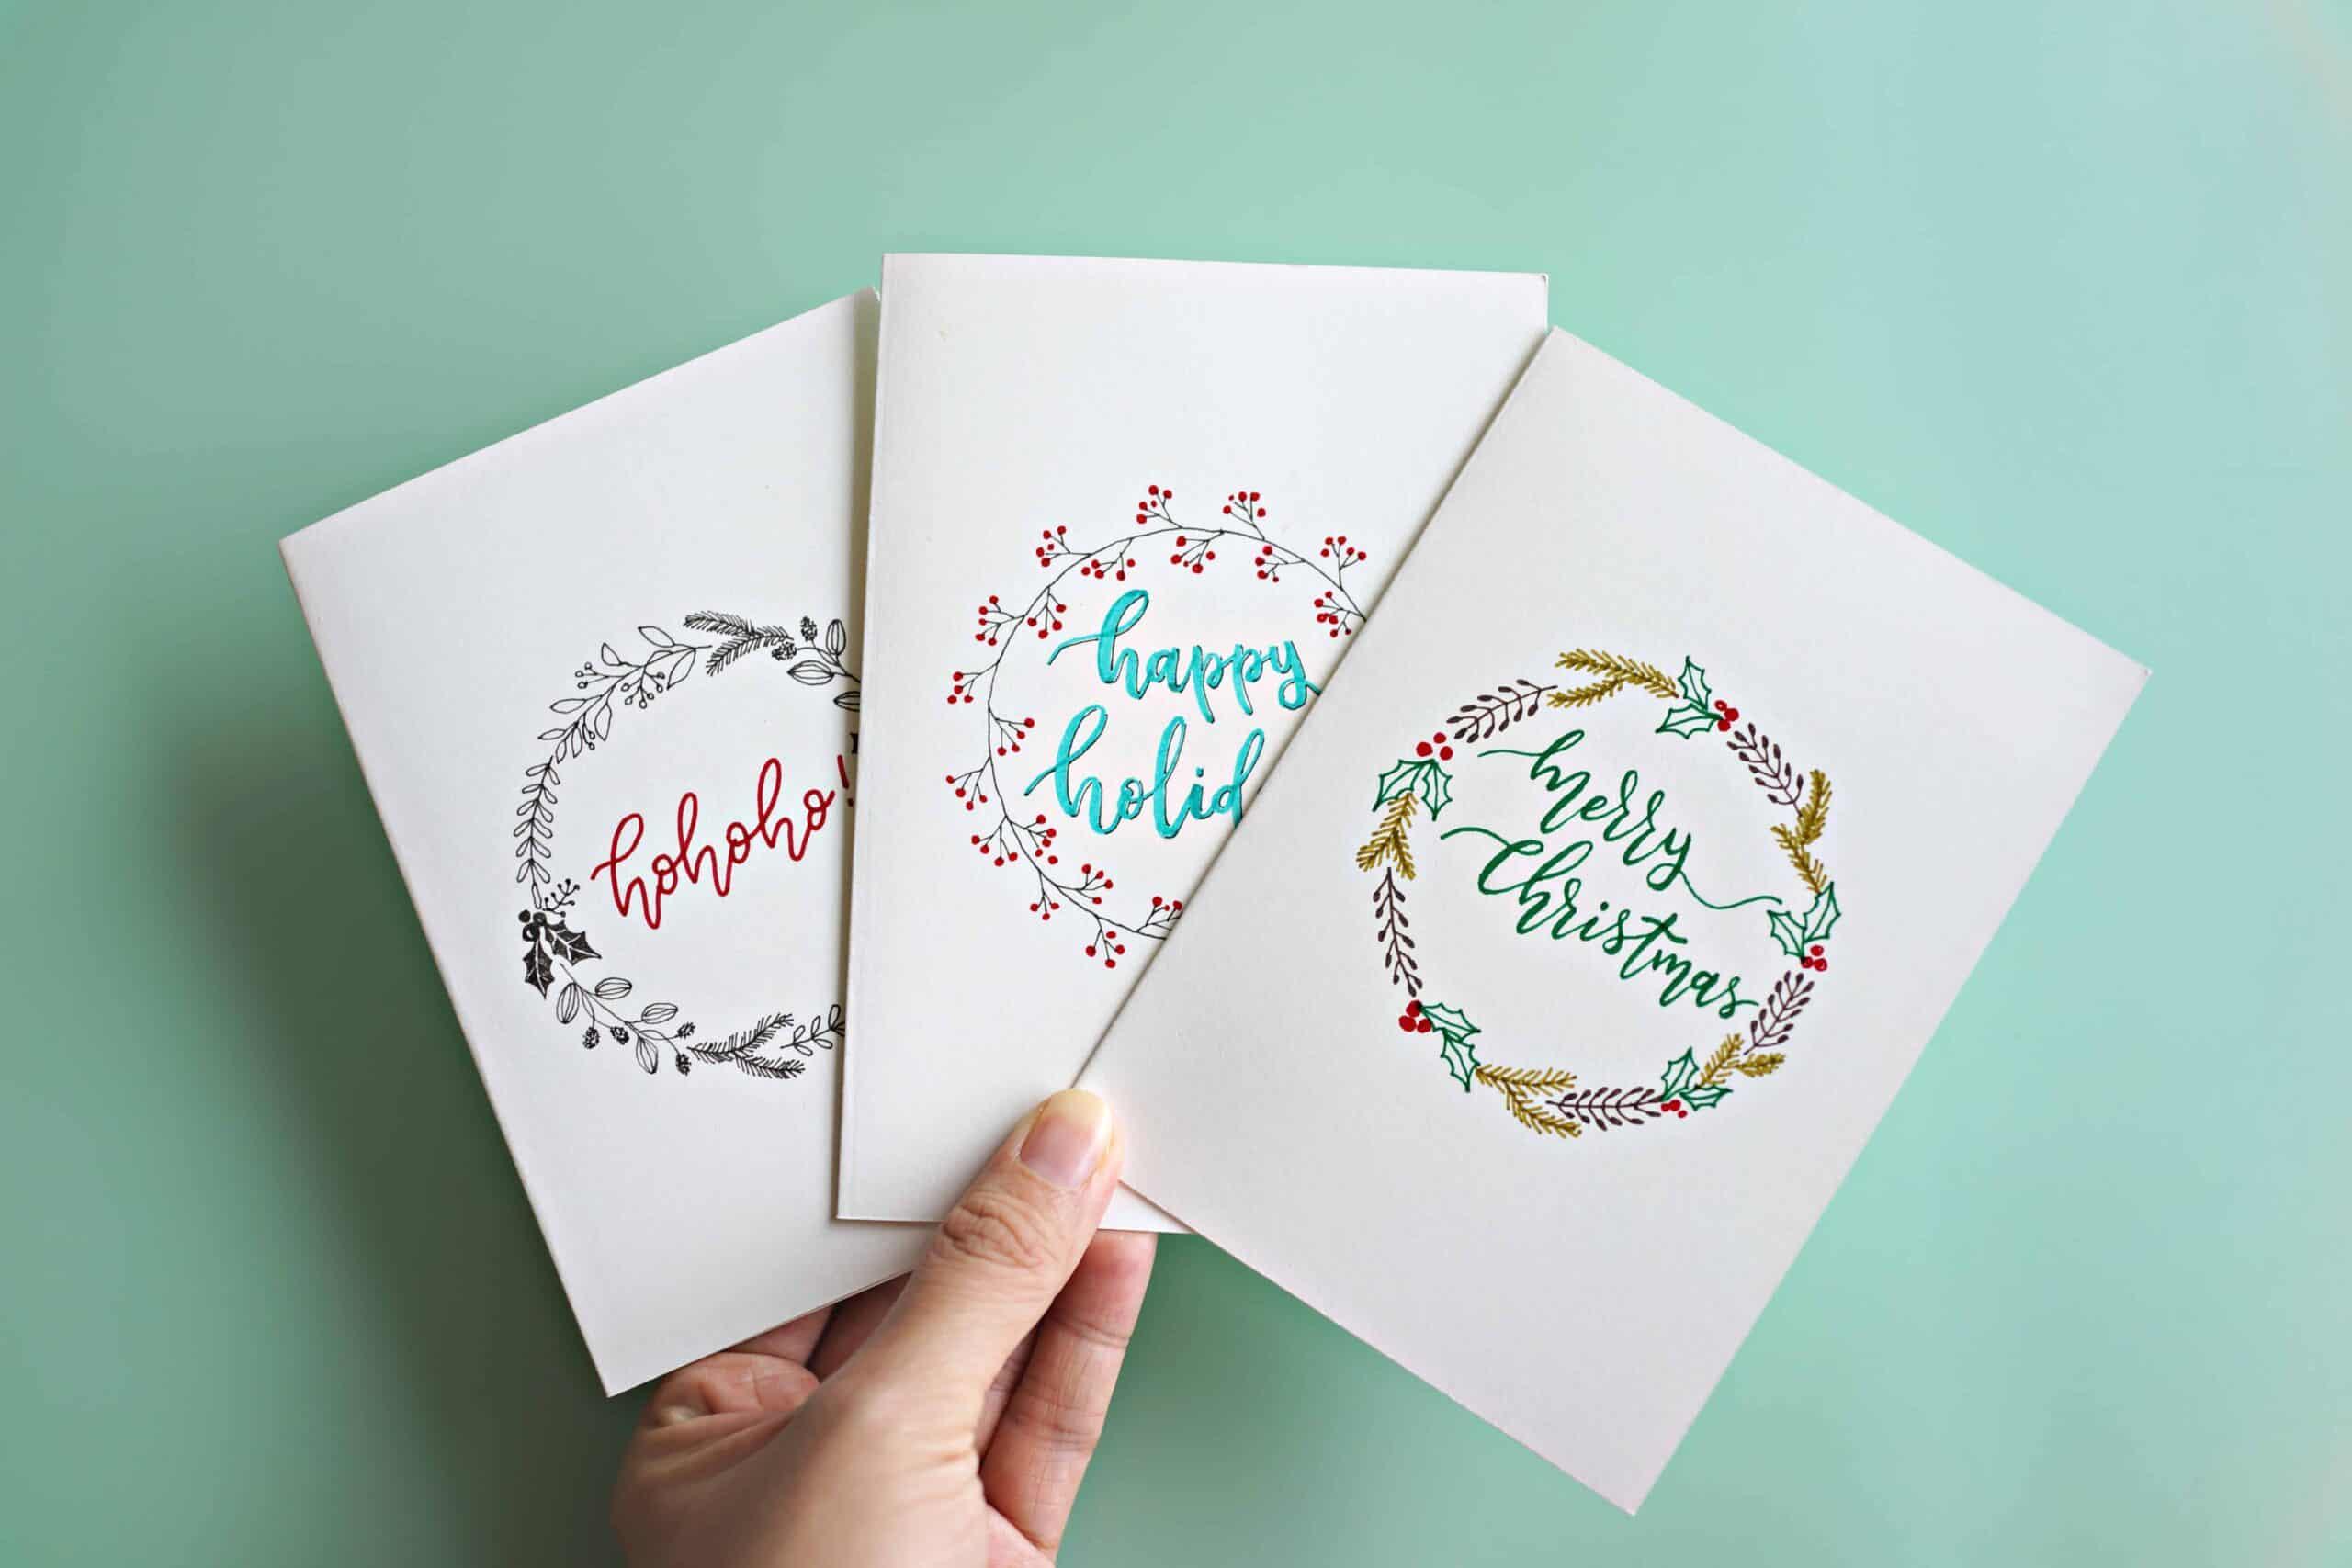 christmas card manners christmas card manners